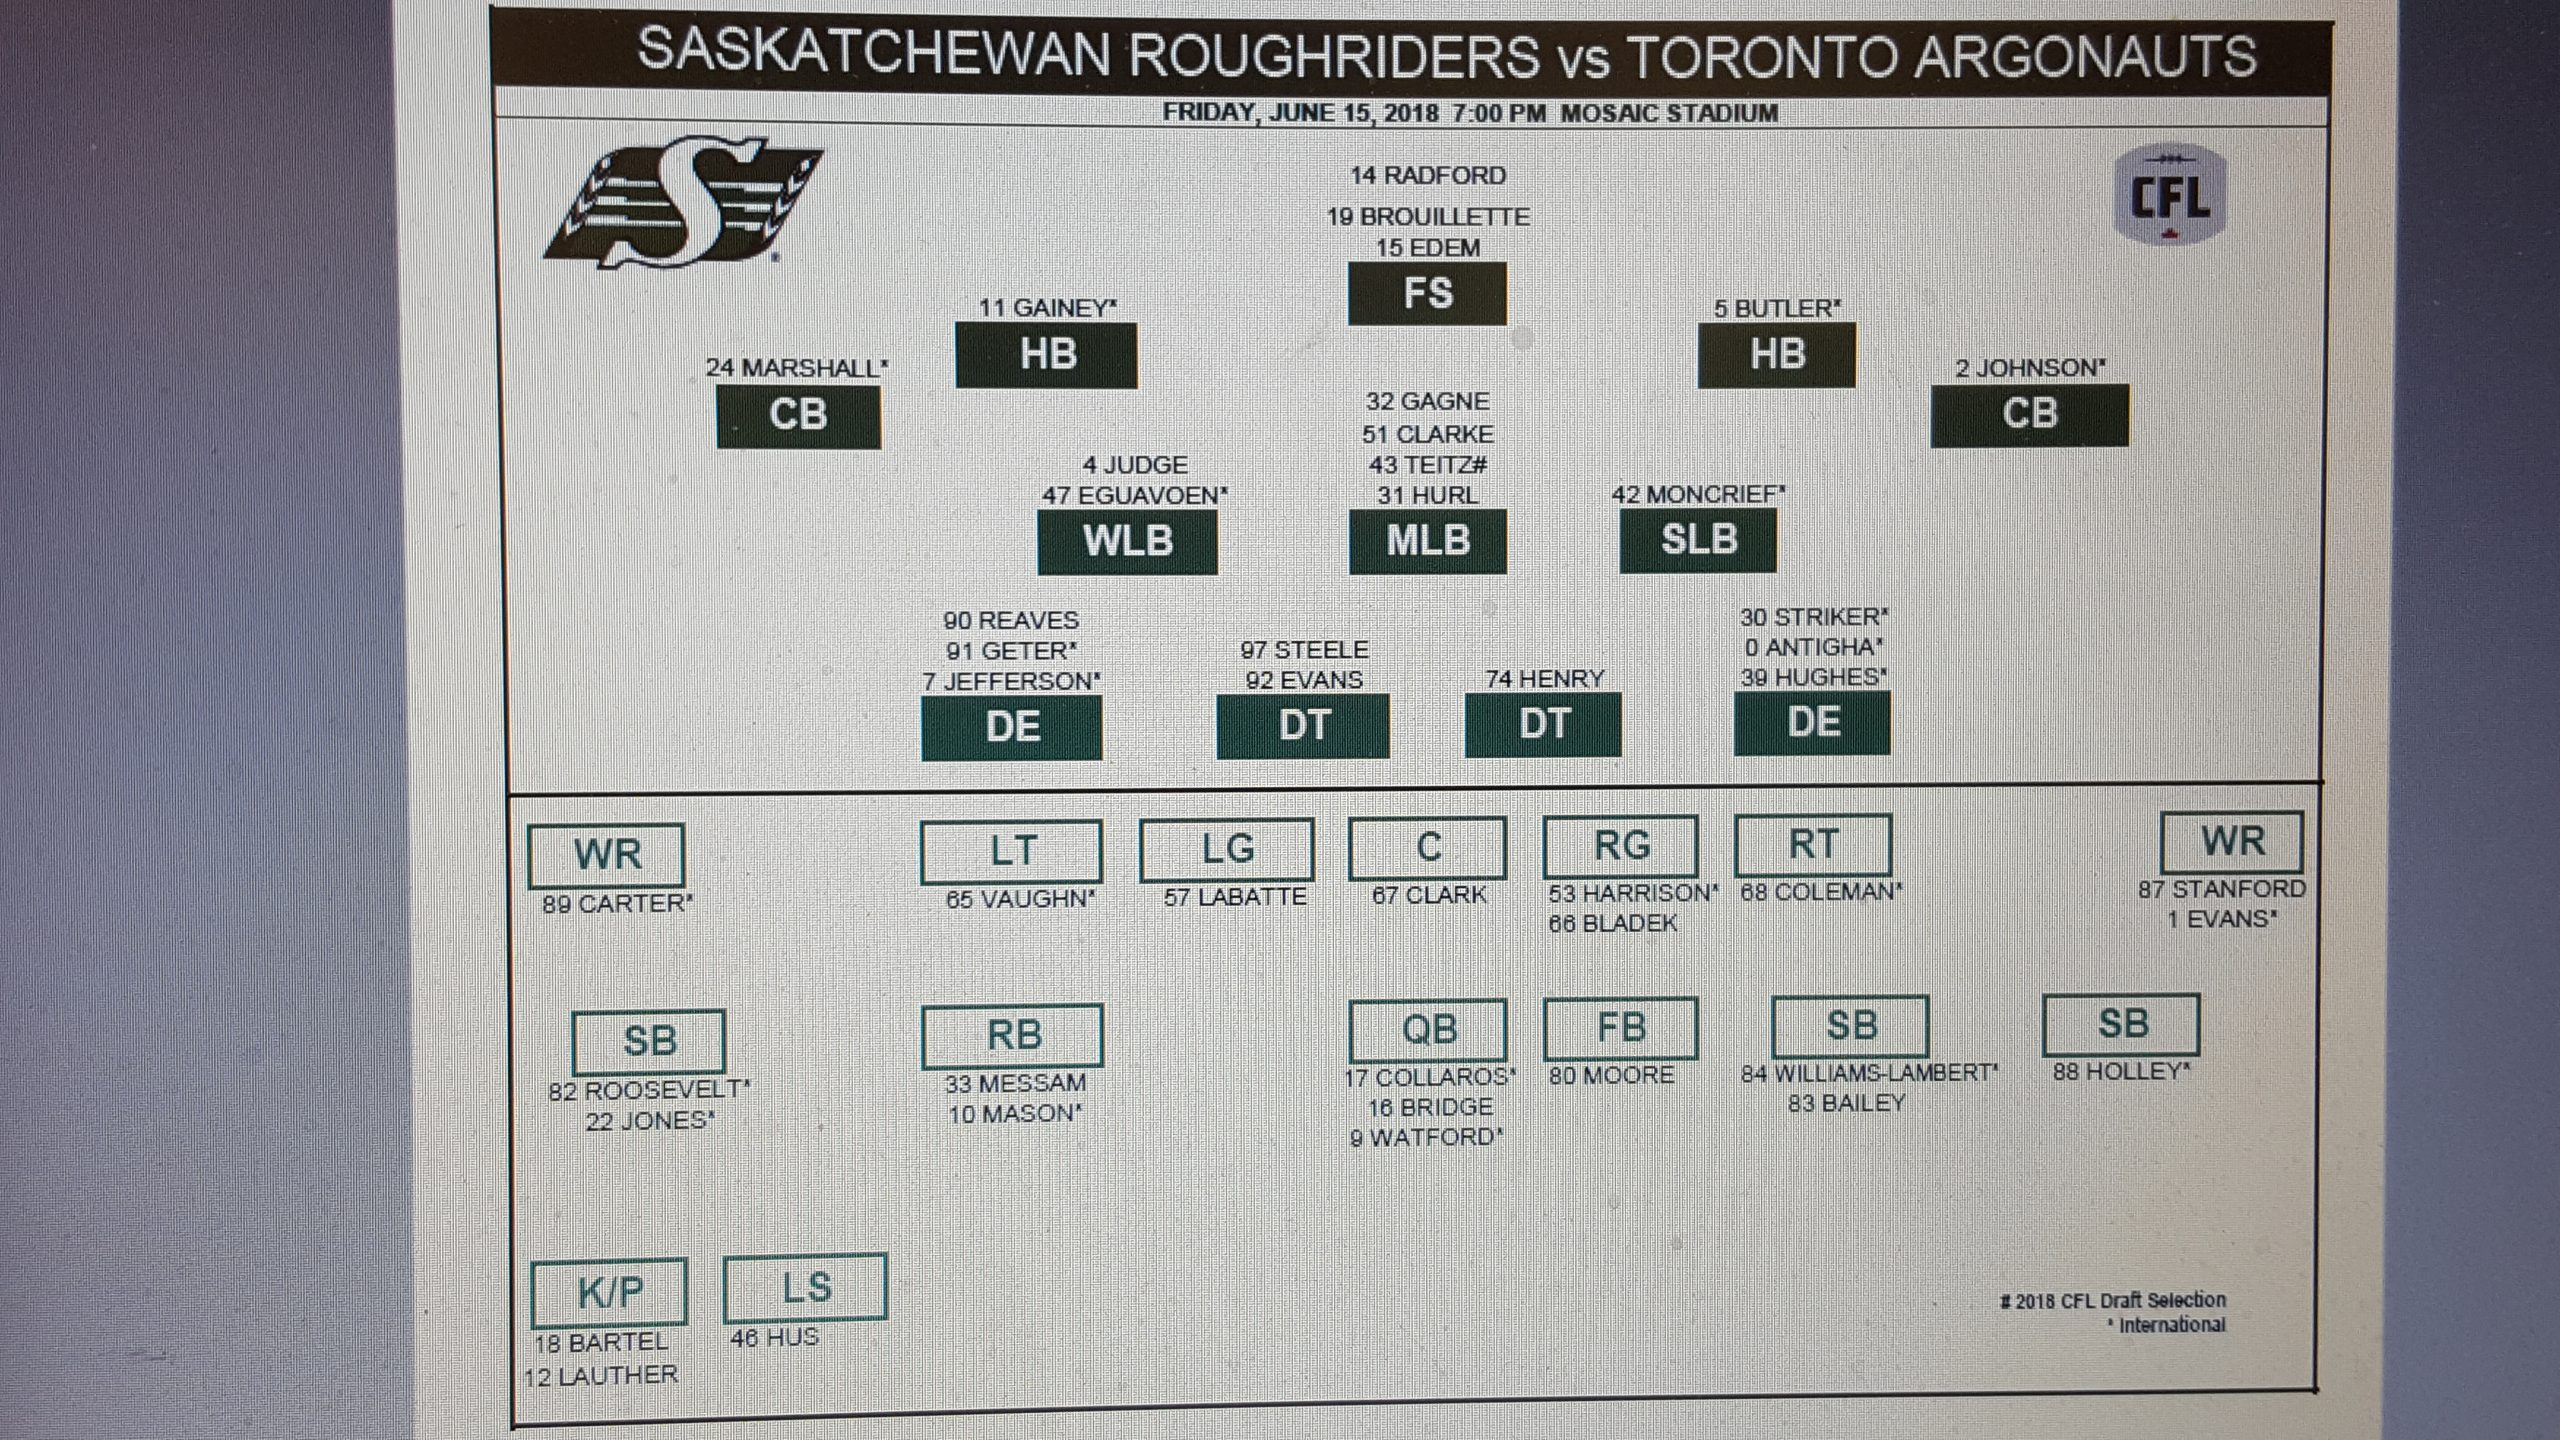 Riders Depth Chart Points to Collaros as Starting QB vs Toronto